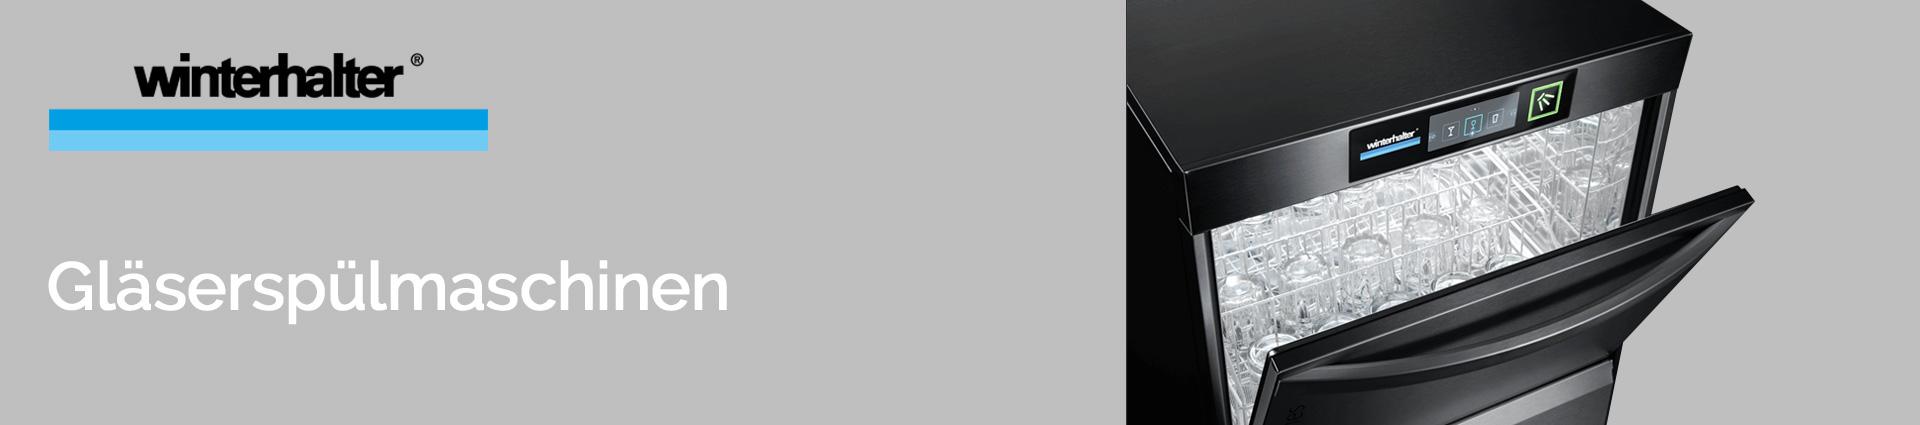 Winterhalter Gläserspülmaschinen Banner